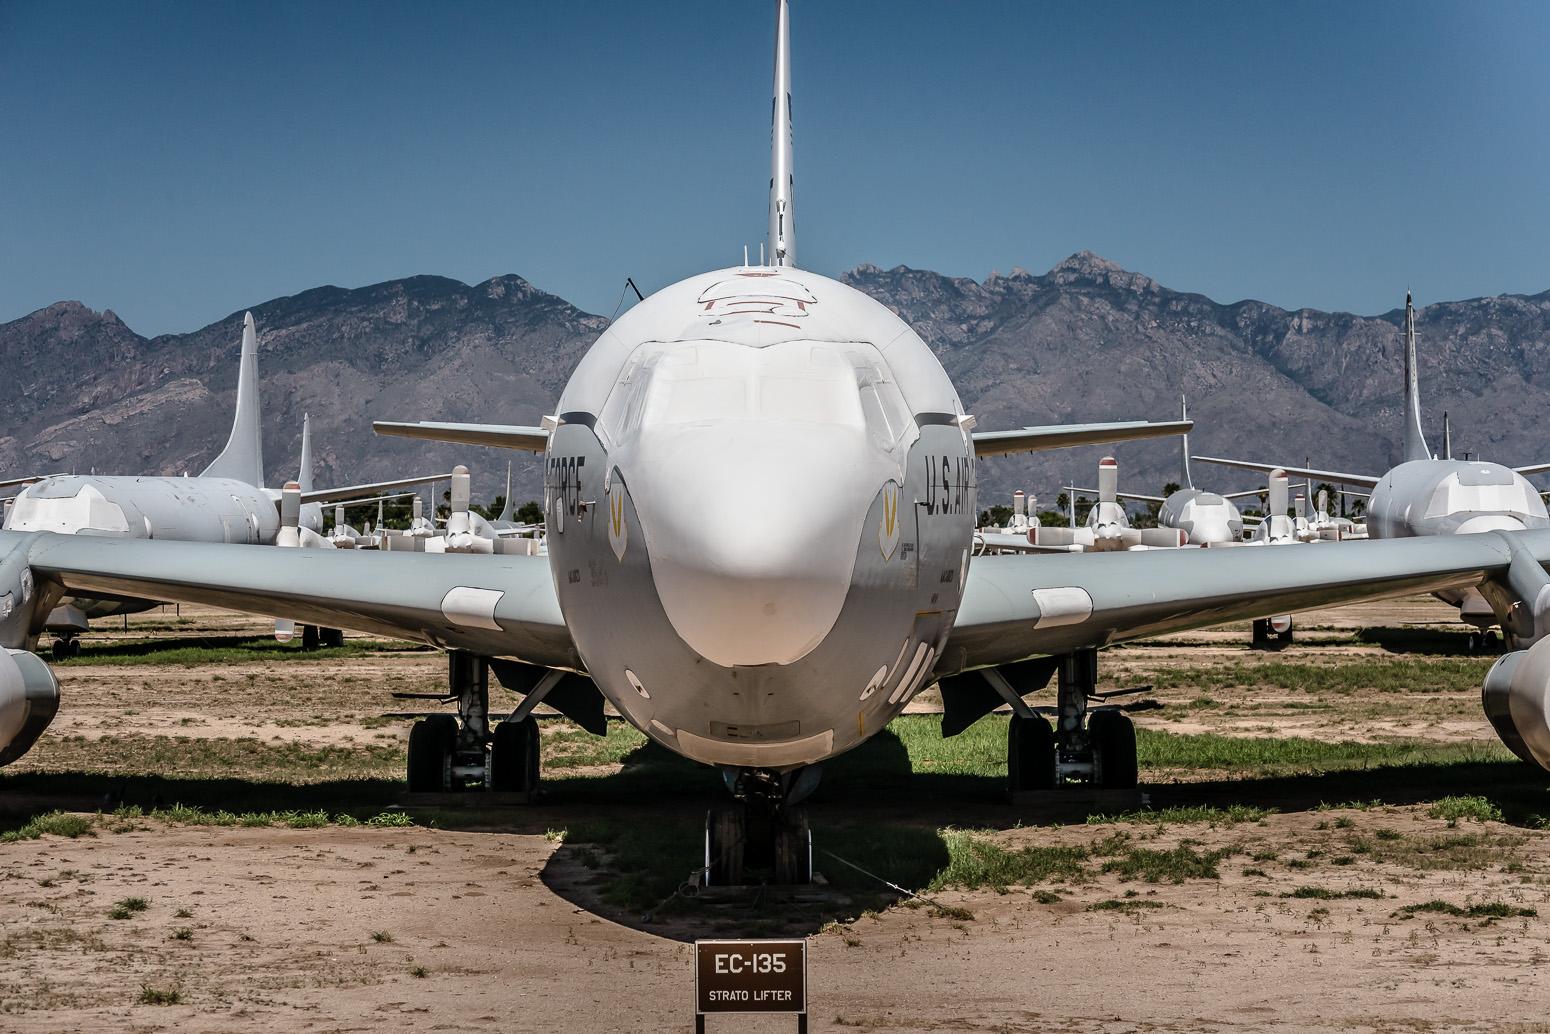 EC-135 Stratolifter, The Boneyard, Davis-Monthan Air Force Base, Tucson, USA